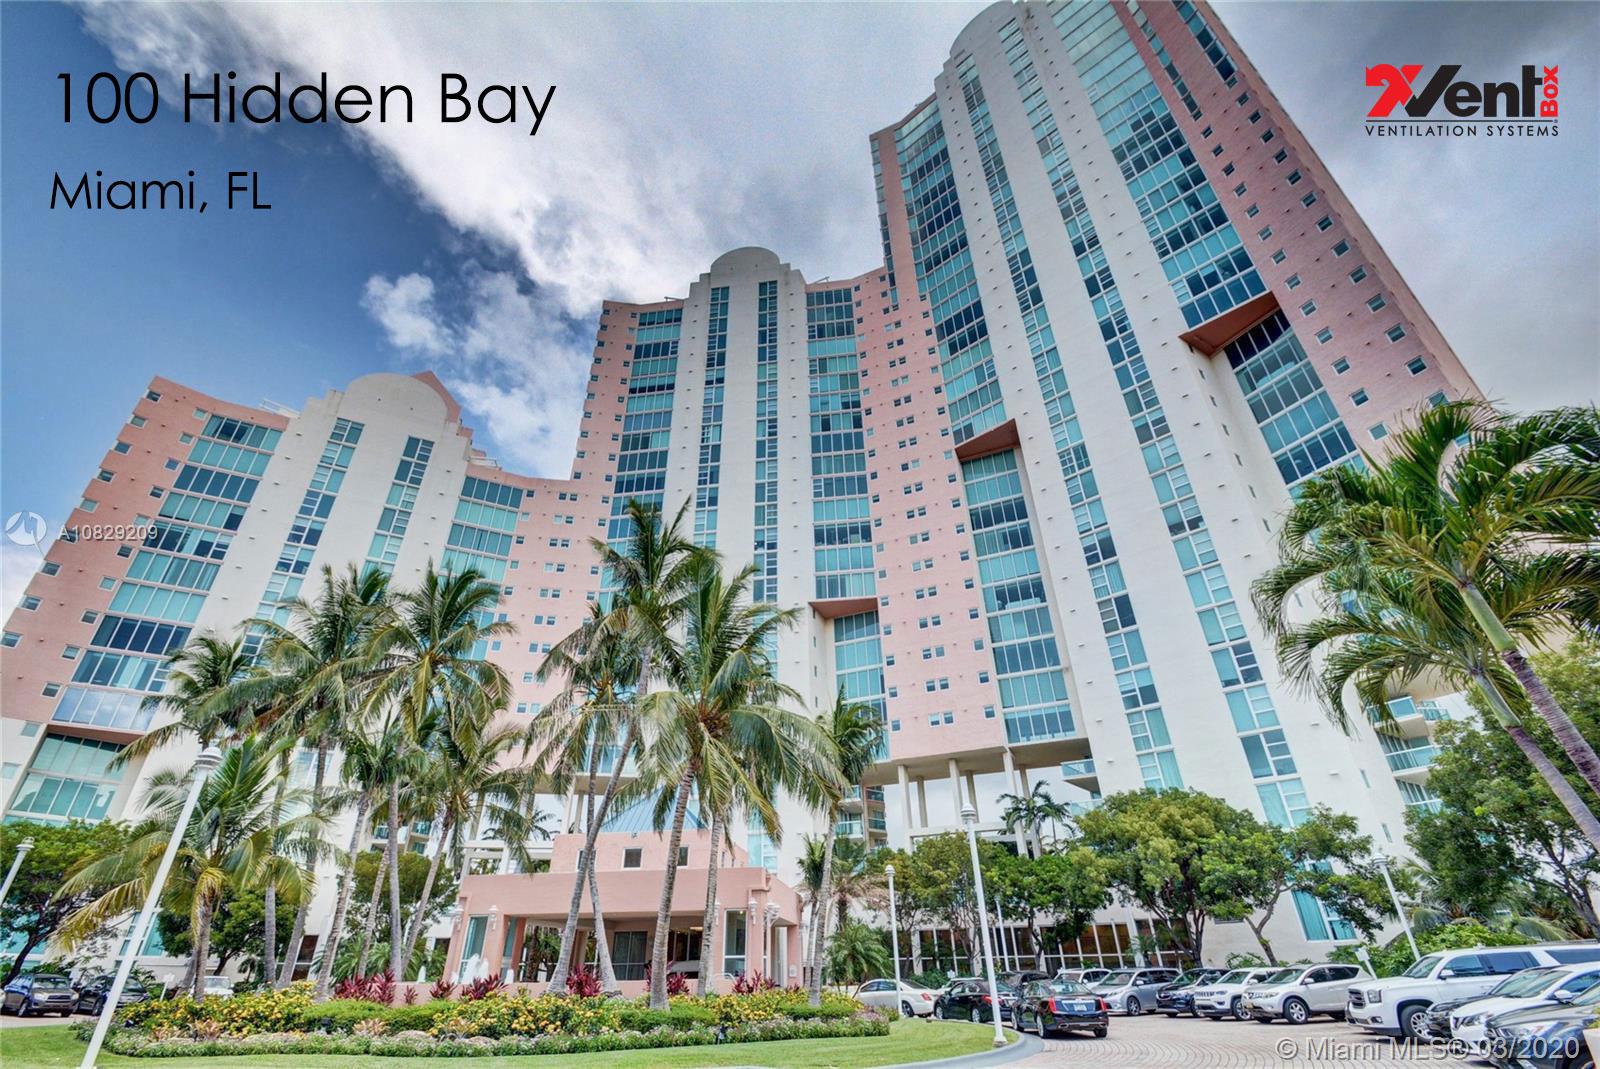 100 Hidden Bay